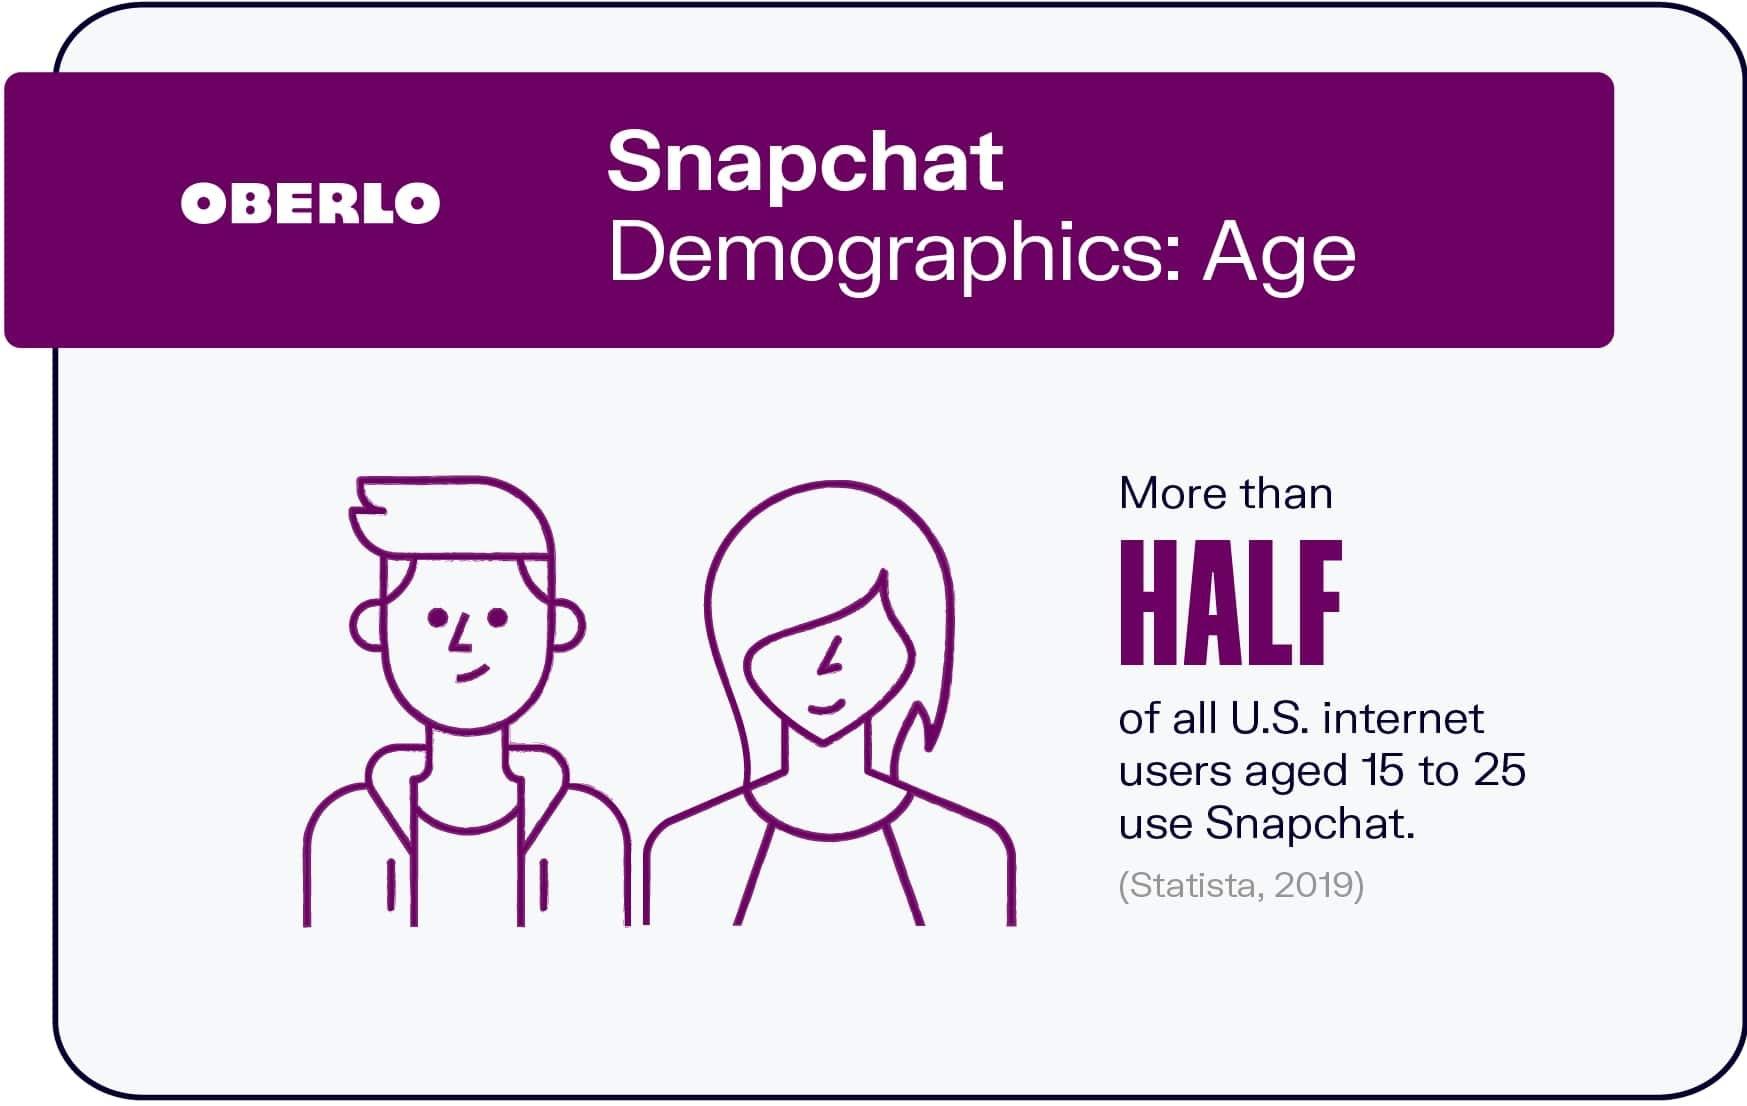 Snapchat Demographics: Age